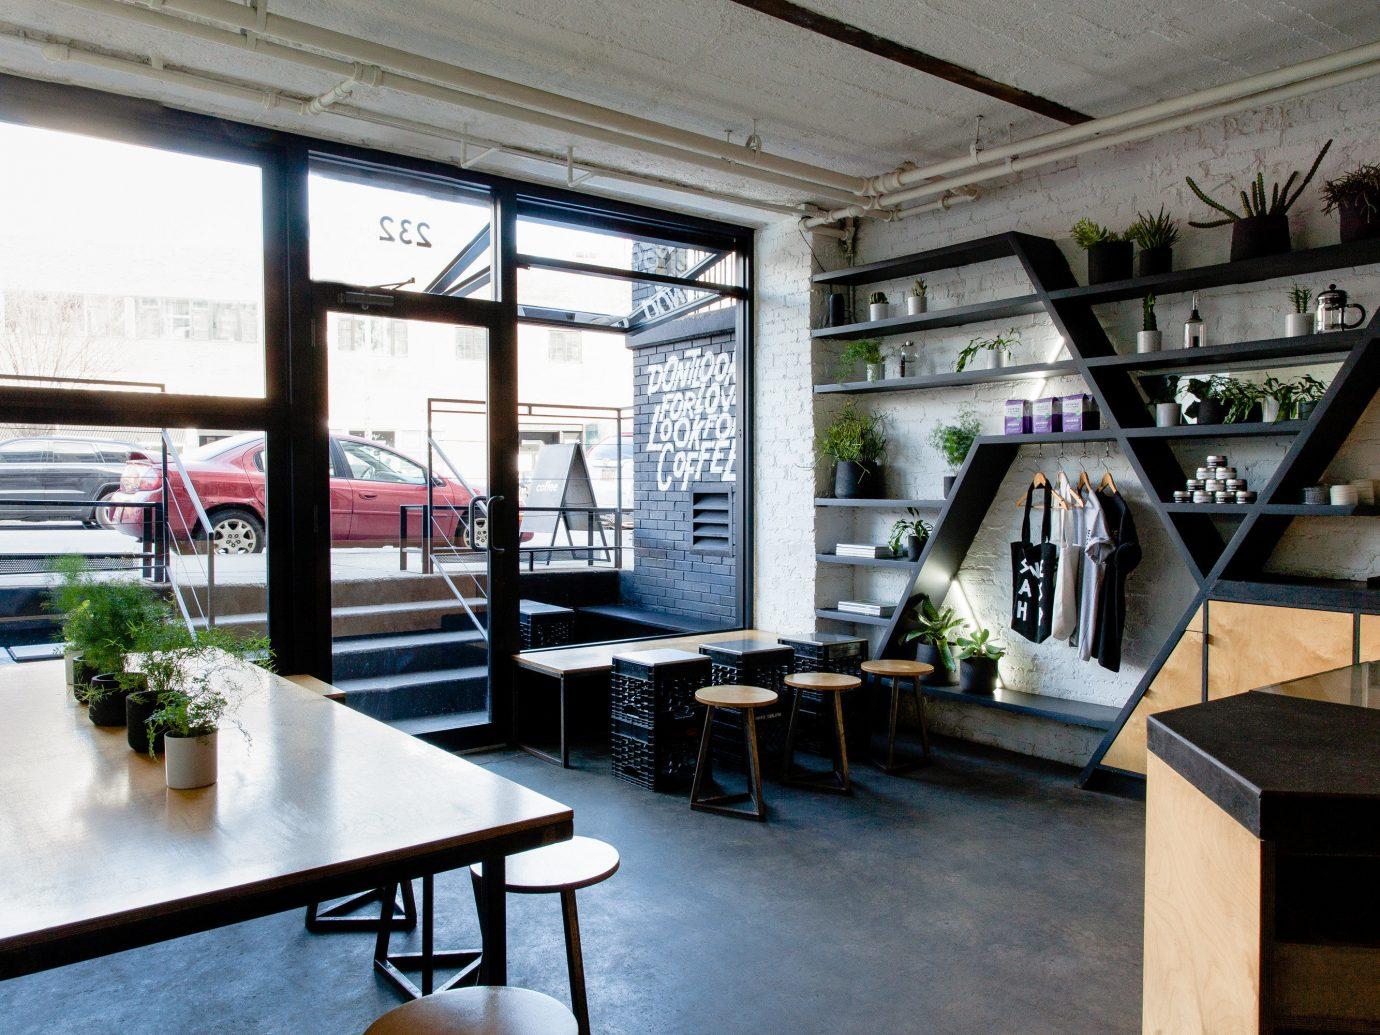 Brooklyn City Food + Drink NYC indoor table floor room window Living ceiling interior design loft furniture Dining area